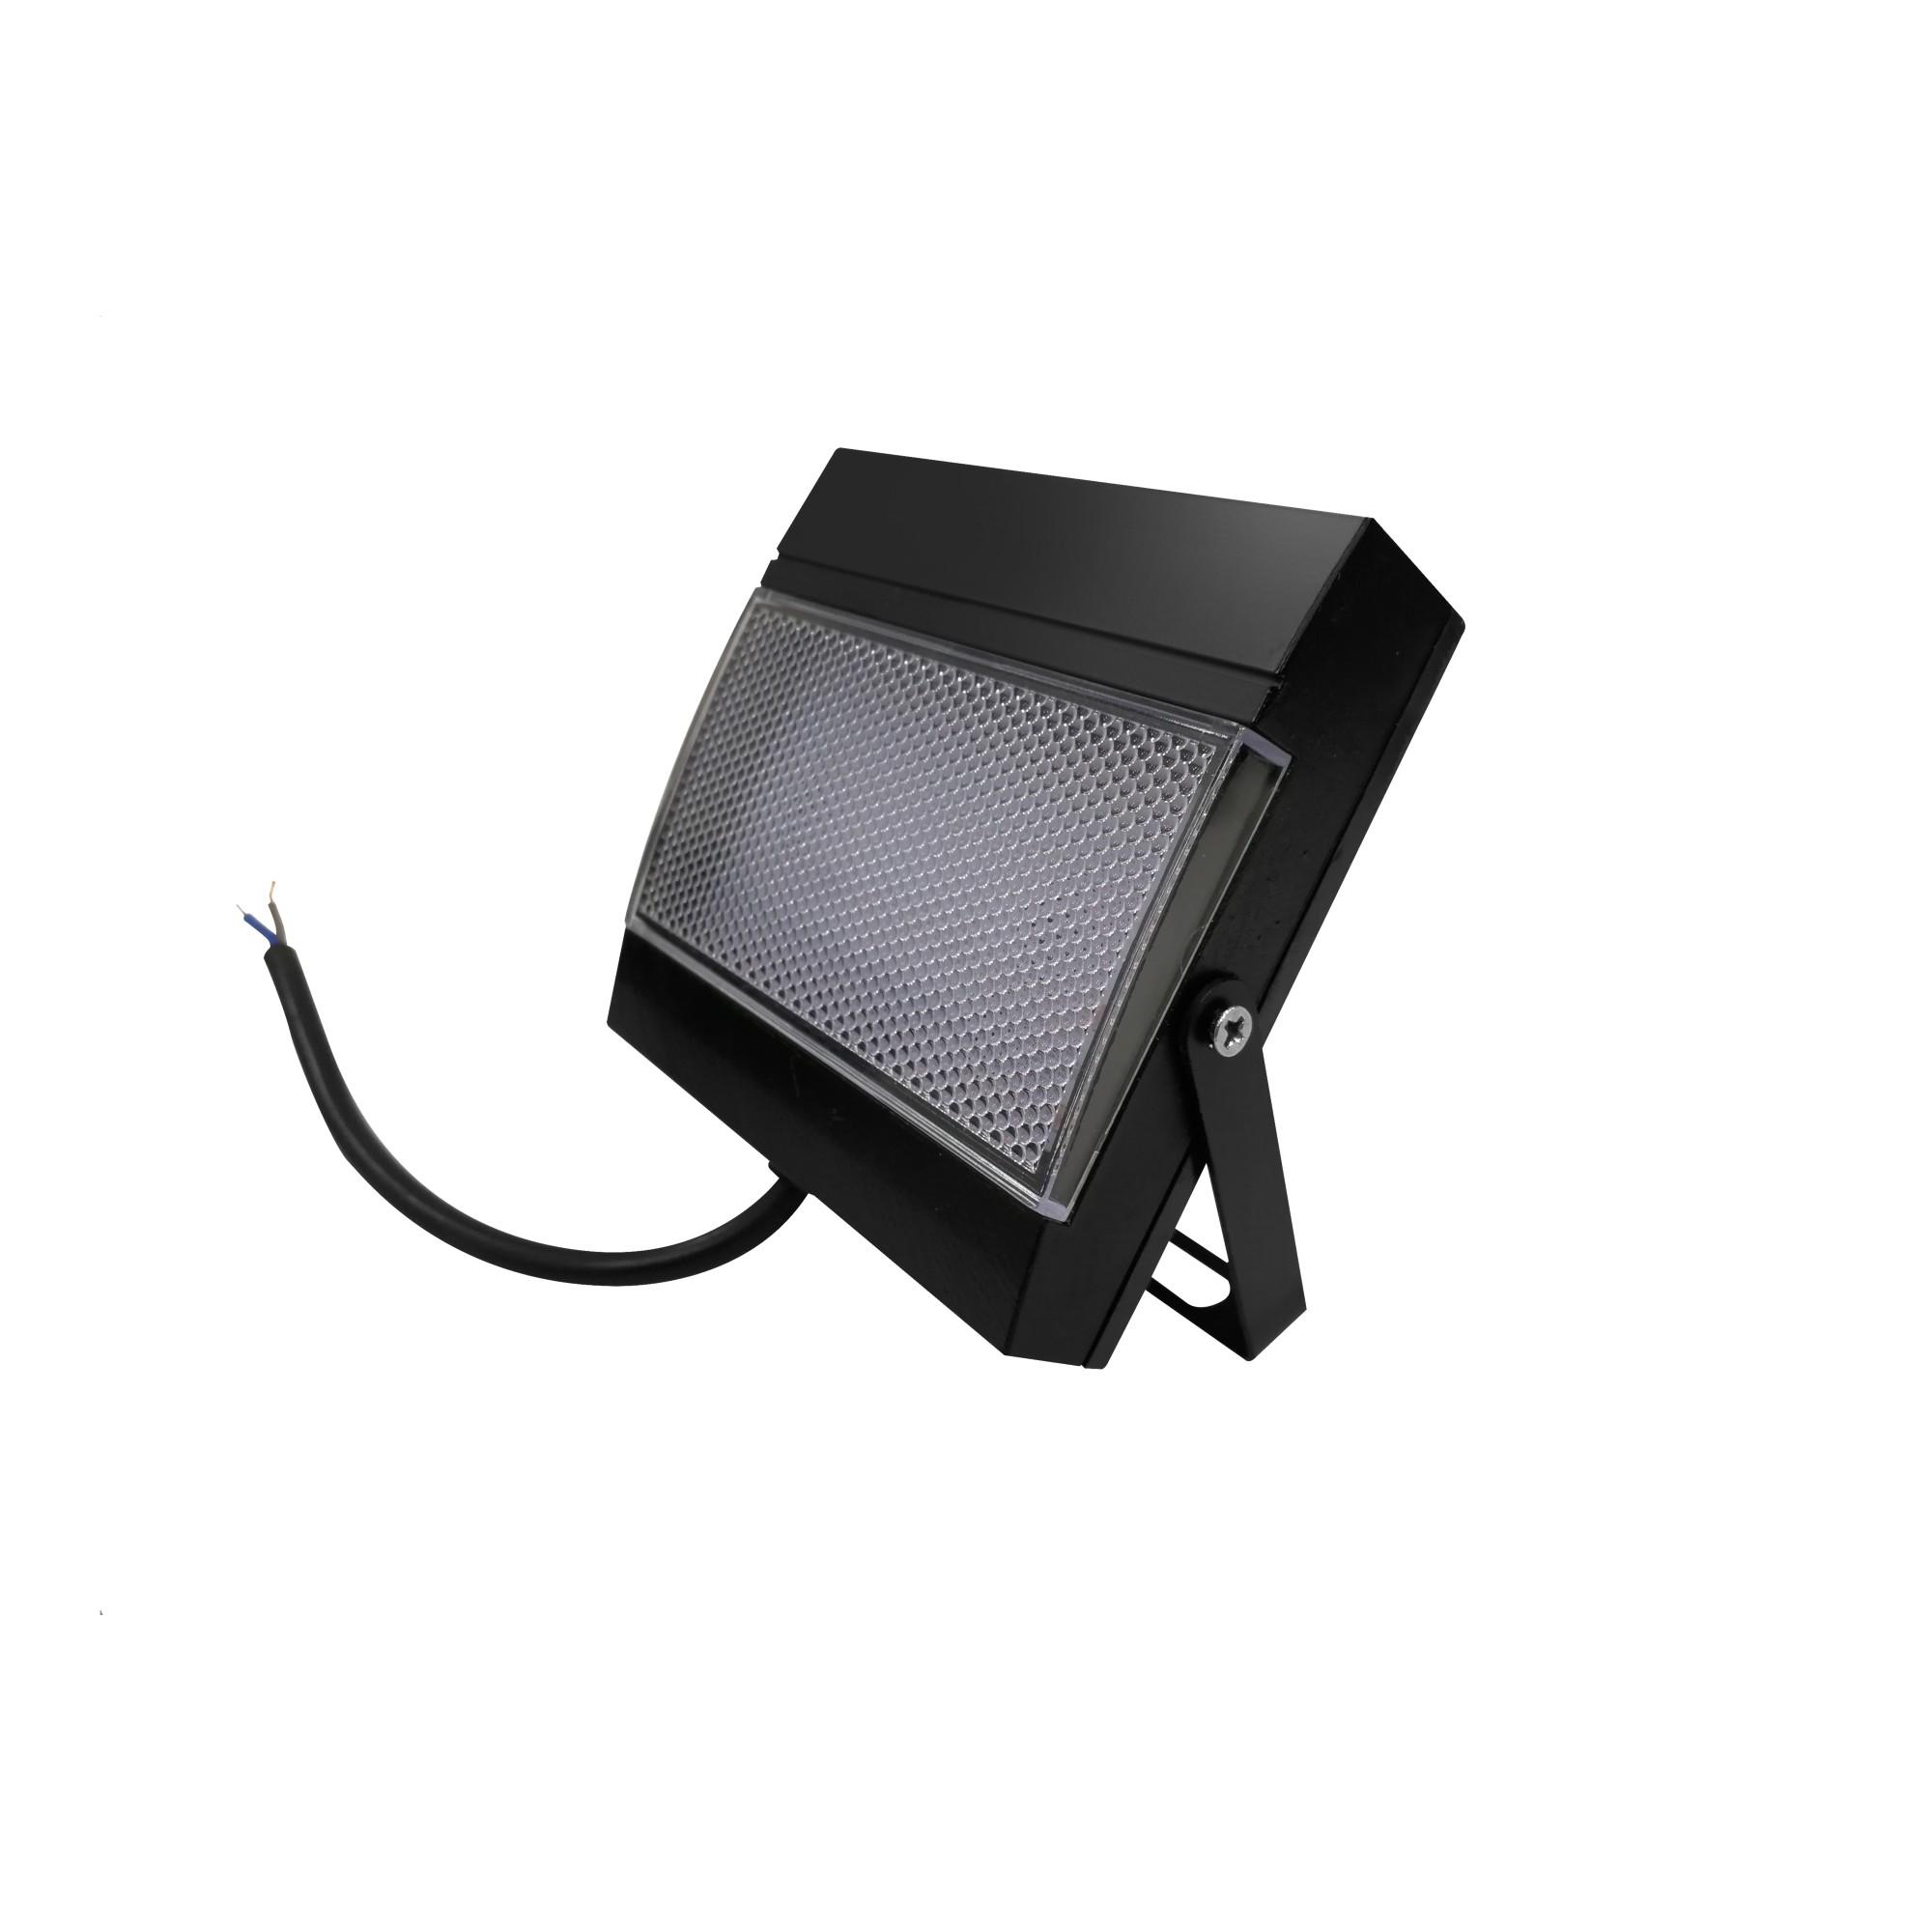 Refletor LED 75W Luz Branca IP65 Preto - Ecoforce